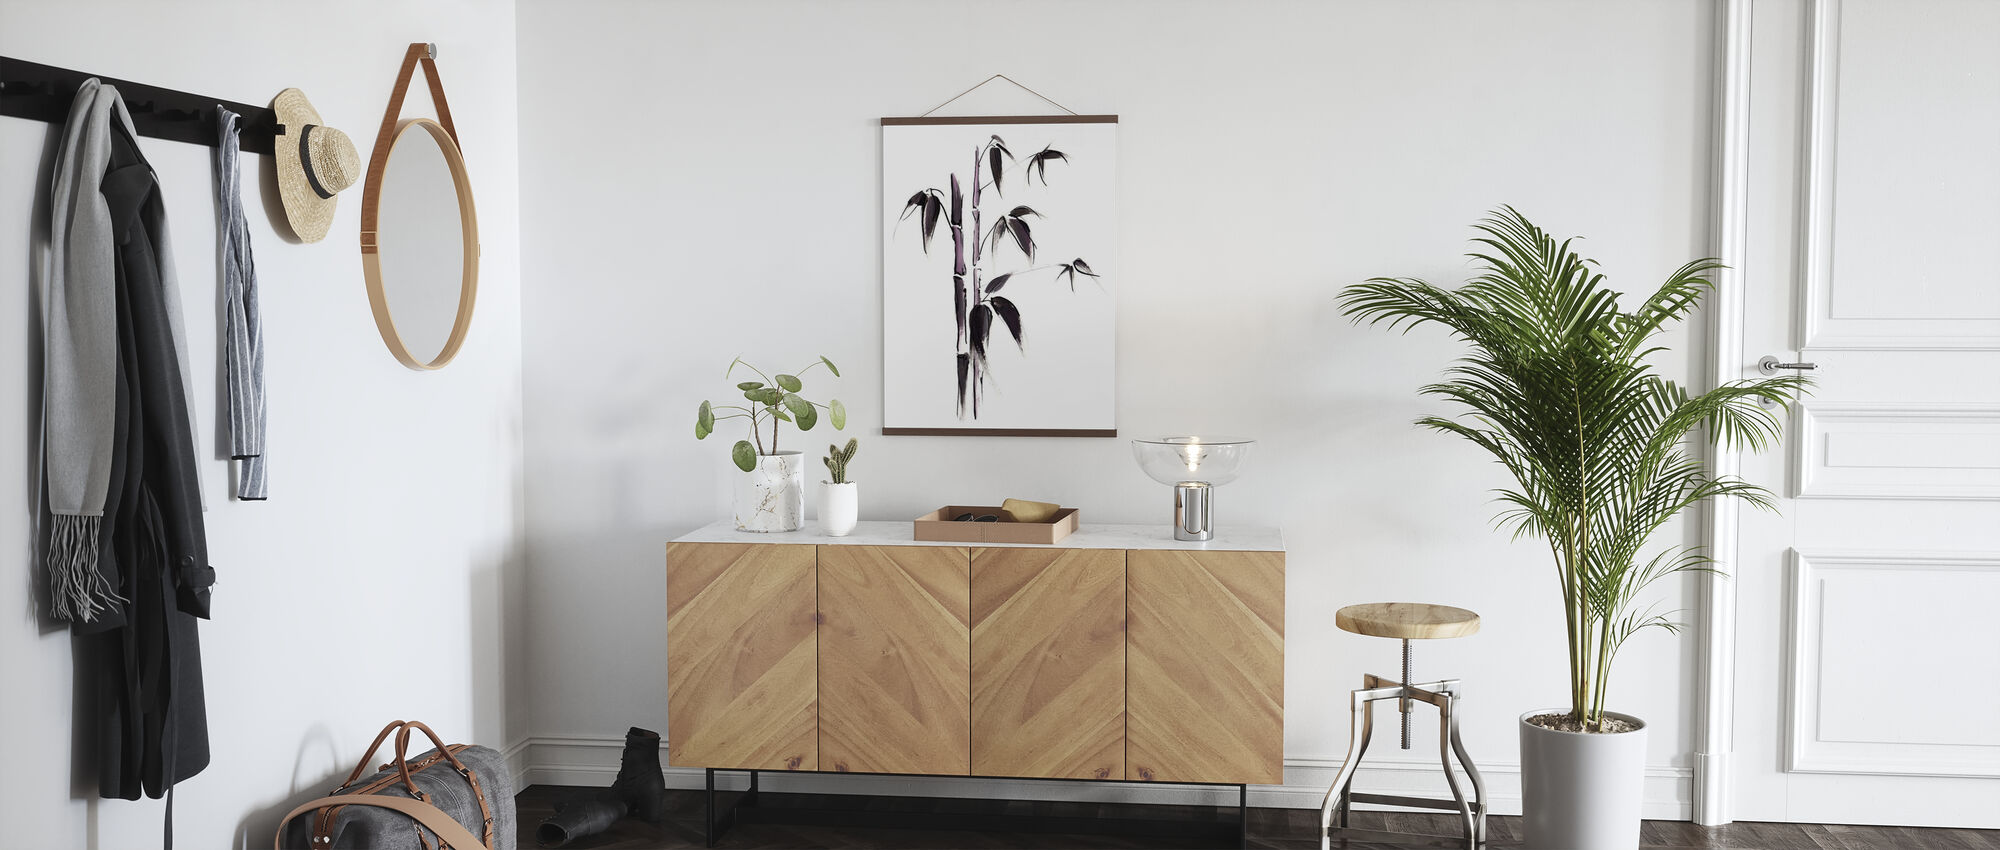 Illustration en bambou - Affiche - Entrée